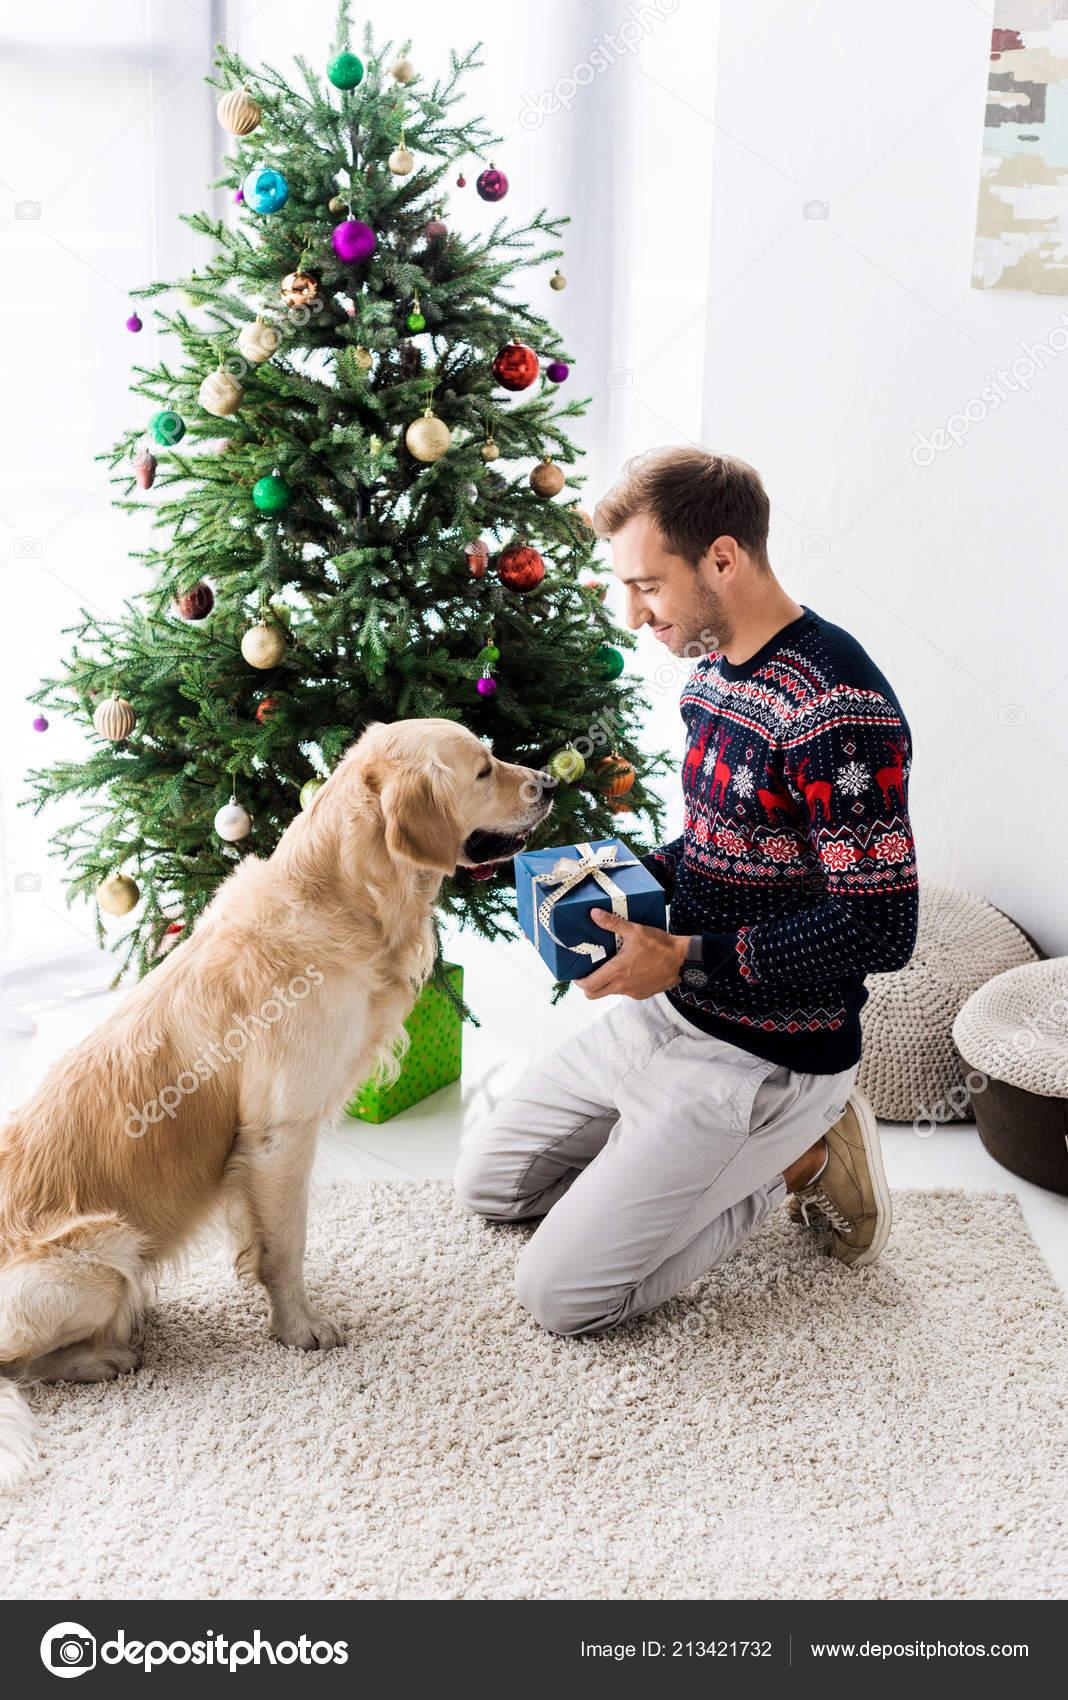 Man Christmas Sweater Giving Gift Box Golden Retriever